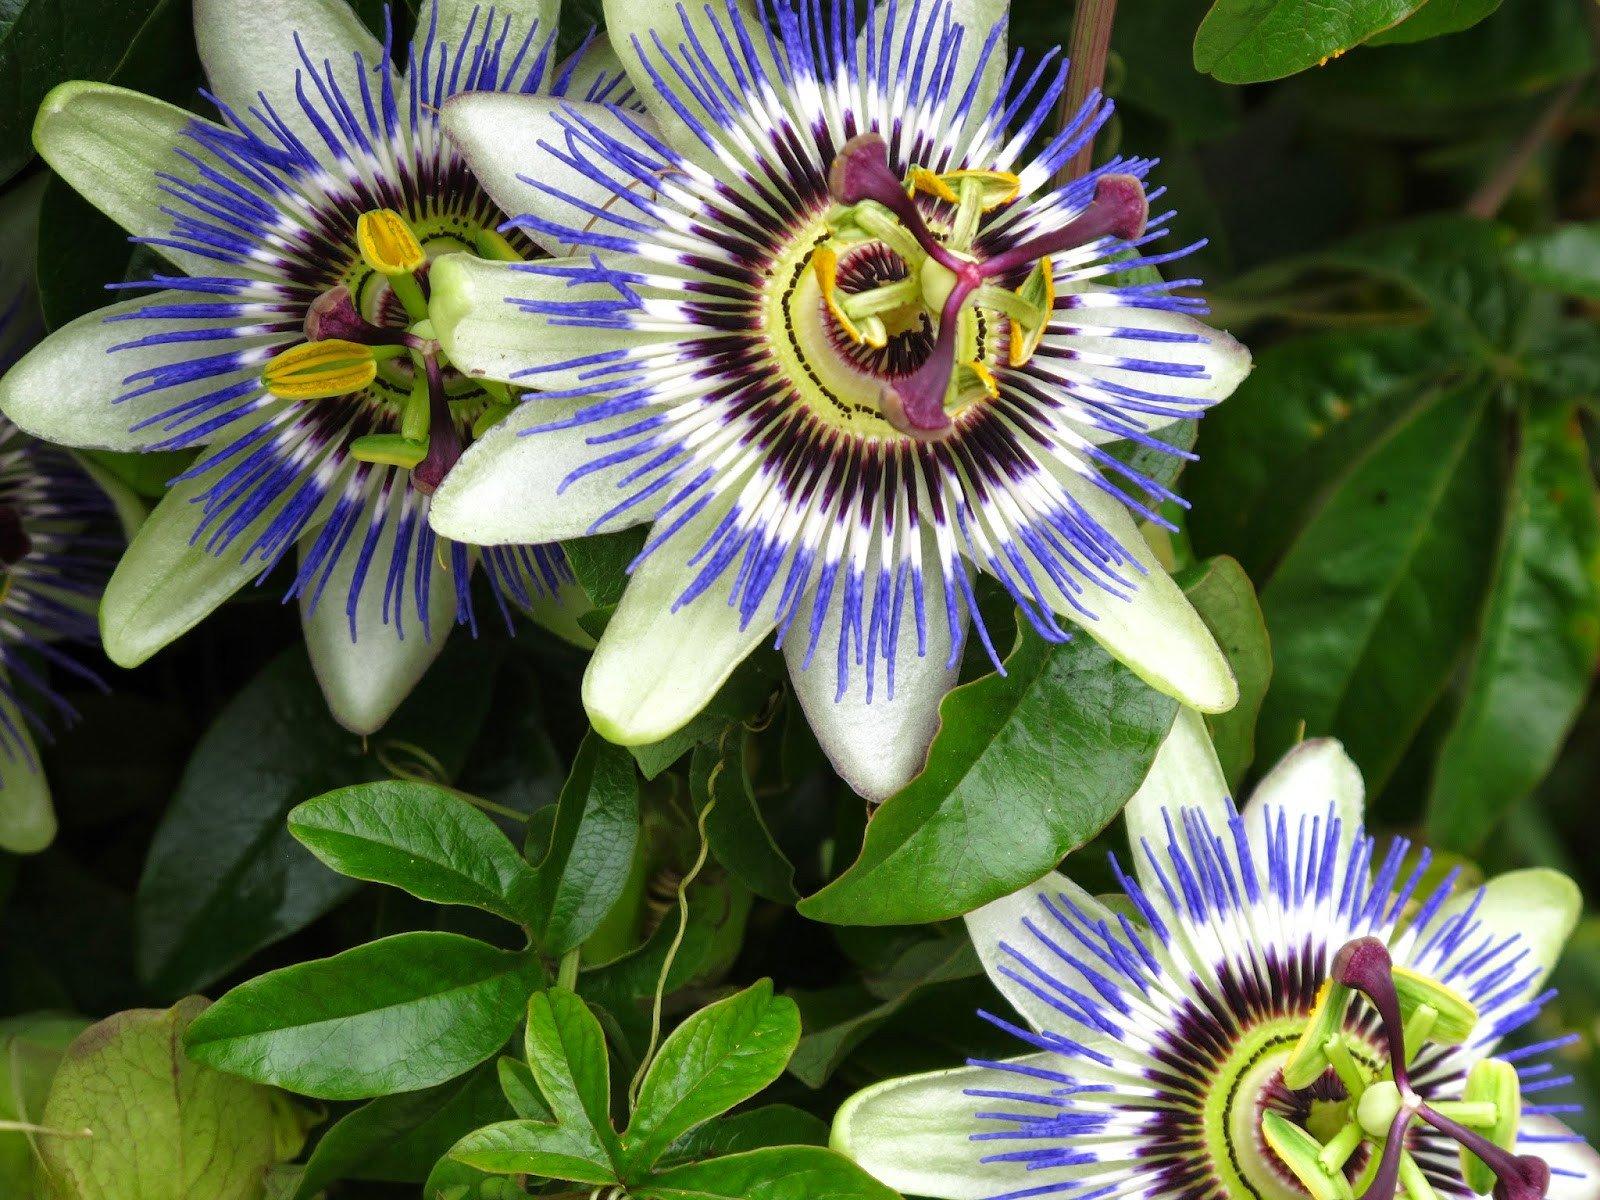 Benefits_Of_Passion_Flower_Passiflora_Incarnata_For_Health_3_9020f7f1-c74a-4bd5-98d4-6372c7cf0feb.jpg